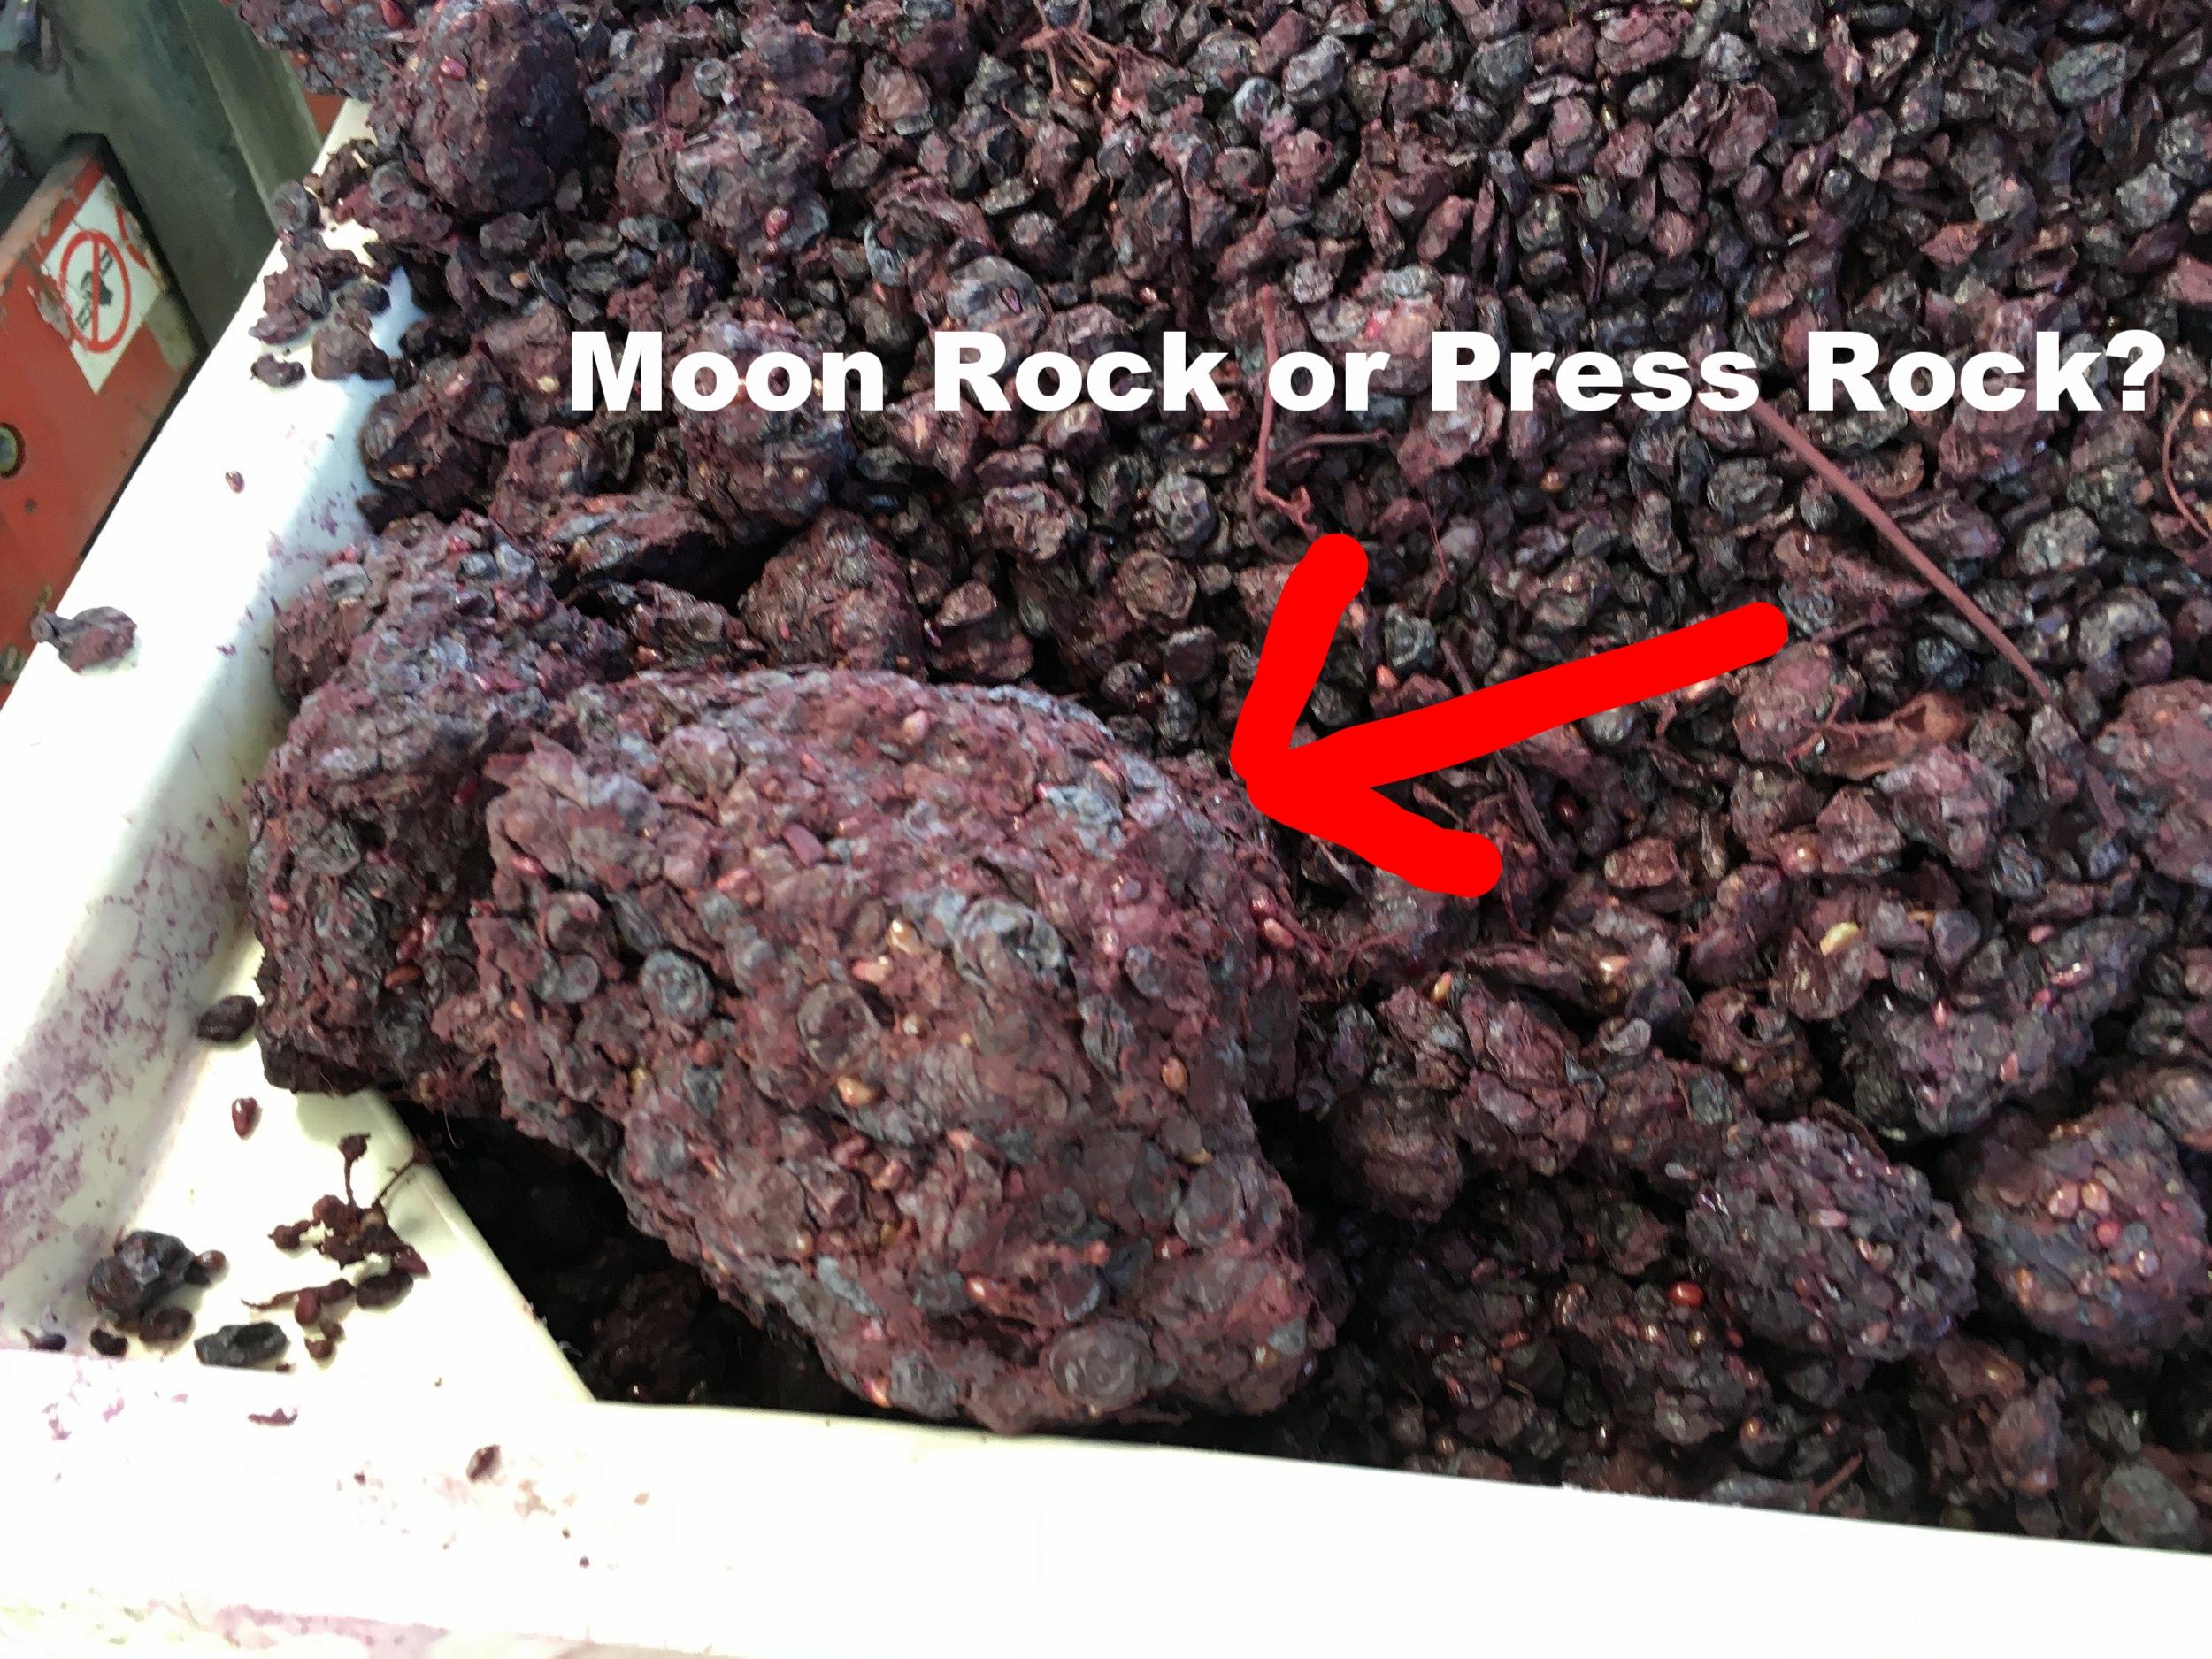 Hard pressing moon rocks